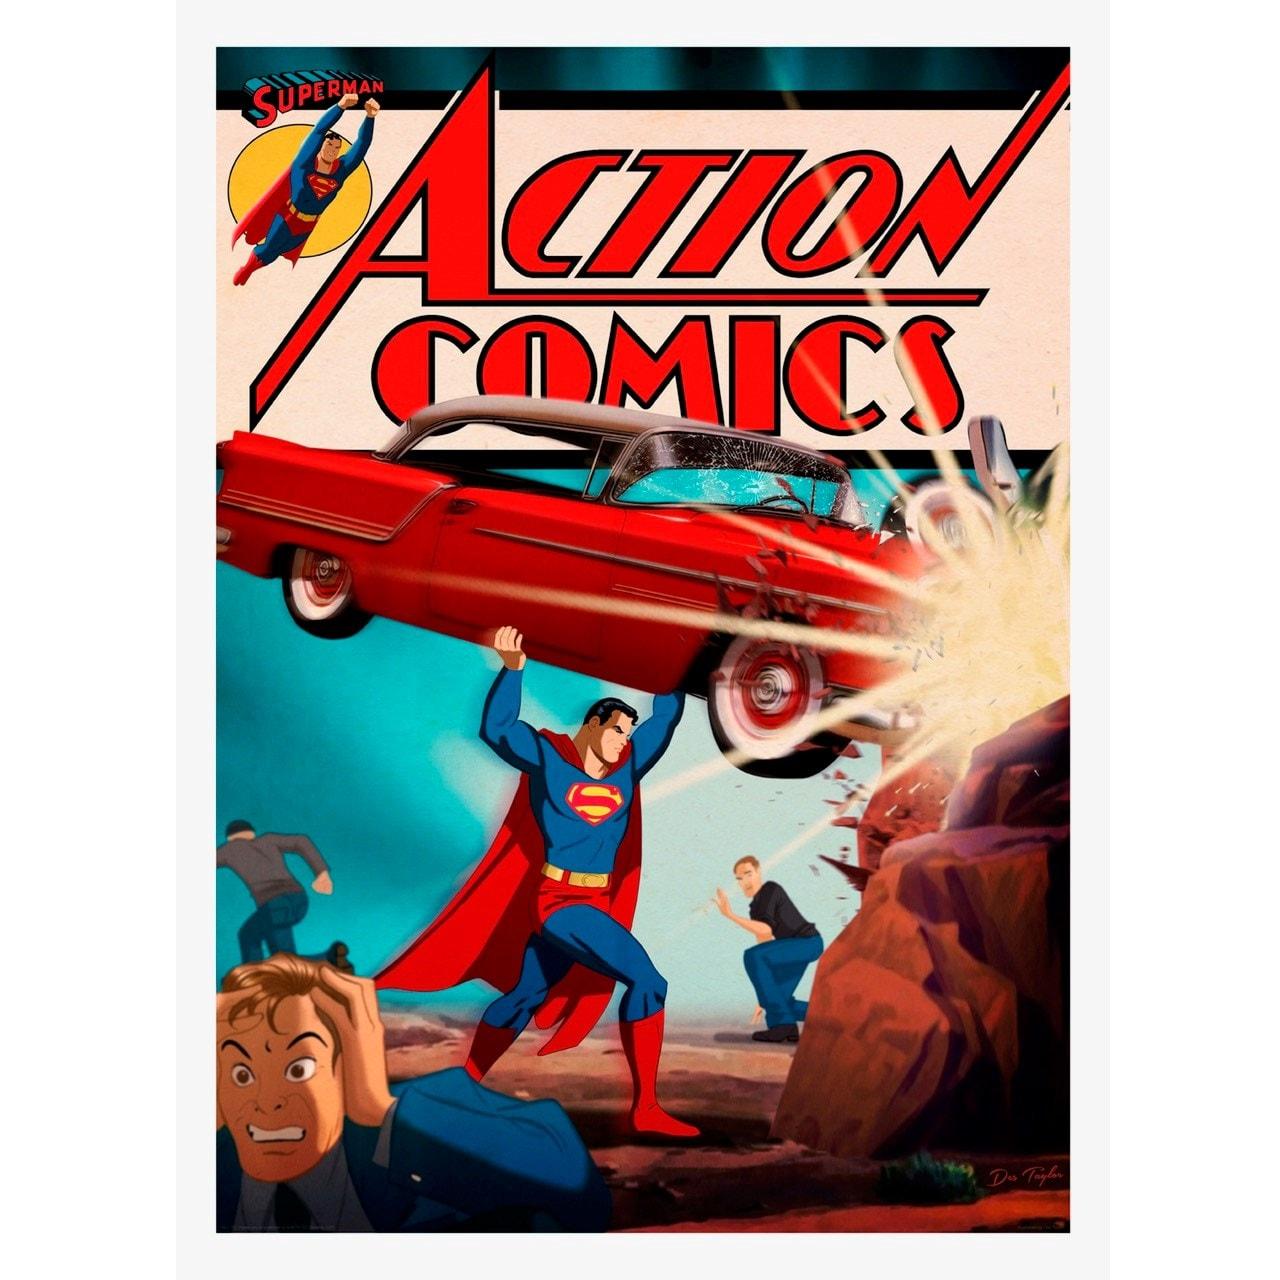 Superman: Action Comics: Limited Edition Art Print - 1